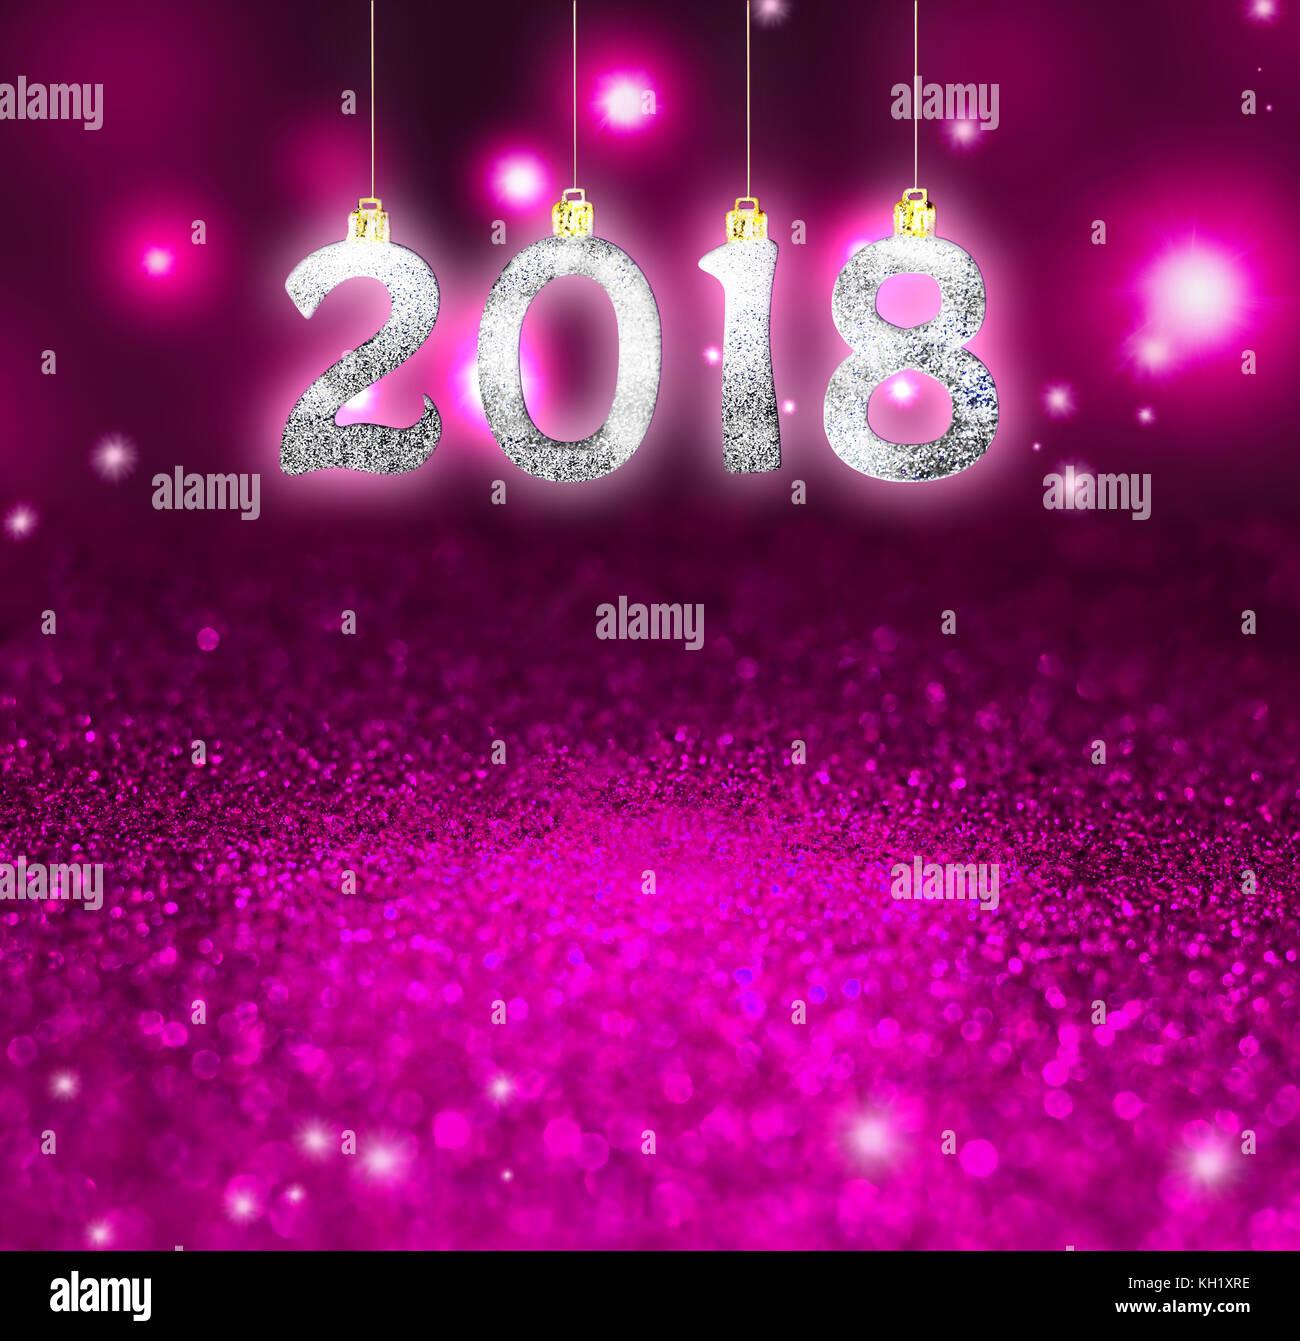 Set of silver shiny digits on glitter background. New year 2018 background. Christmas. - Stock Image